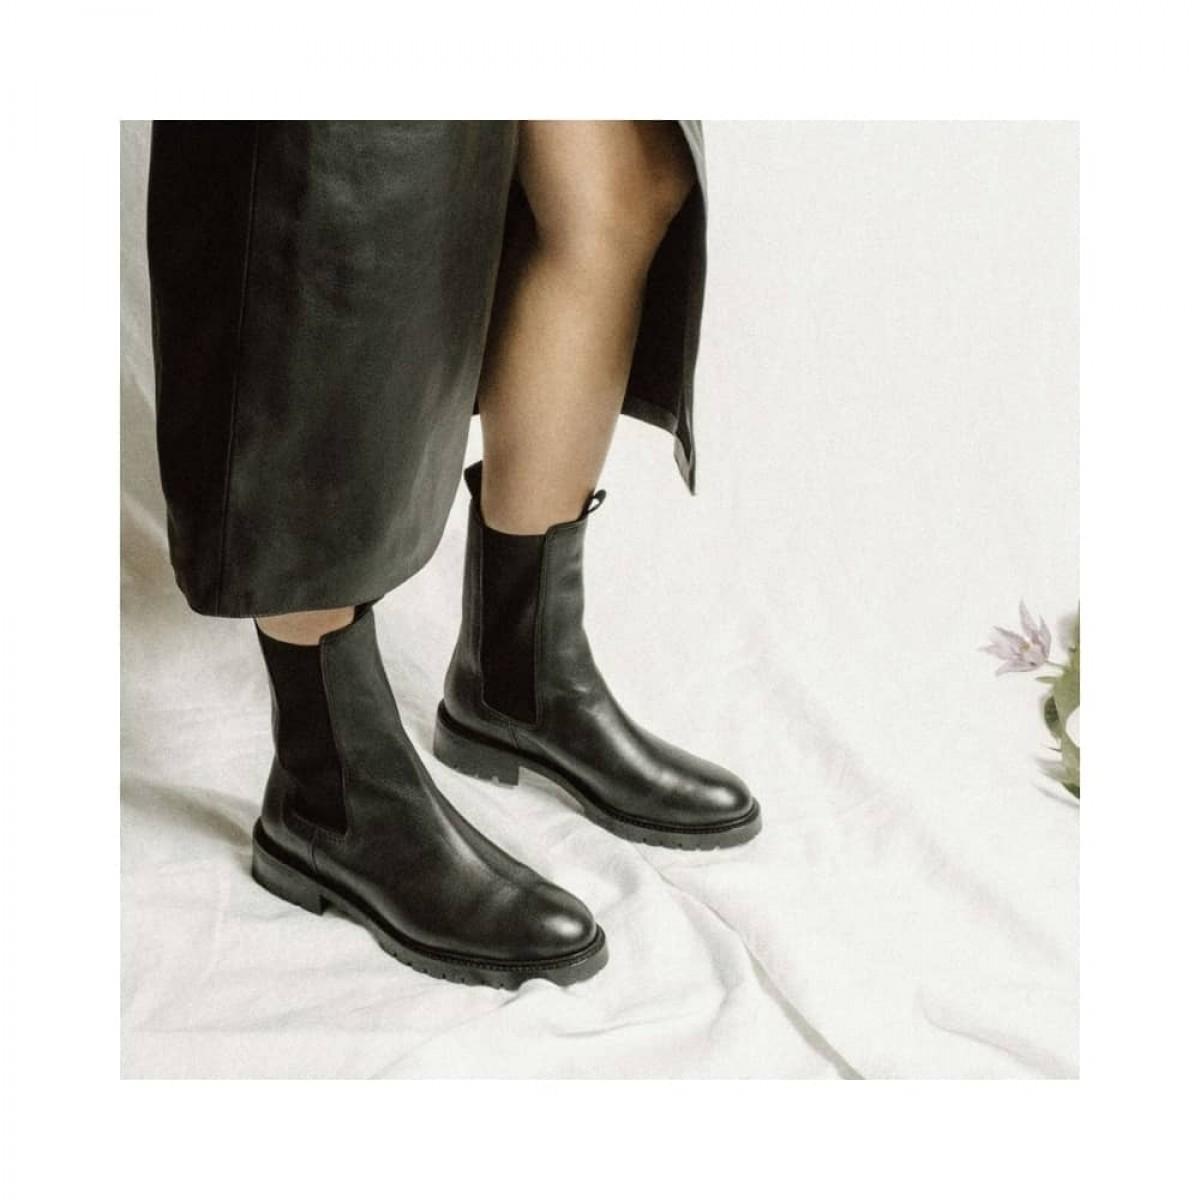 haily soft calf - black - model billede